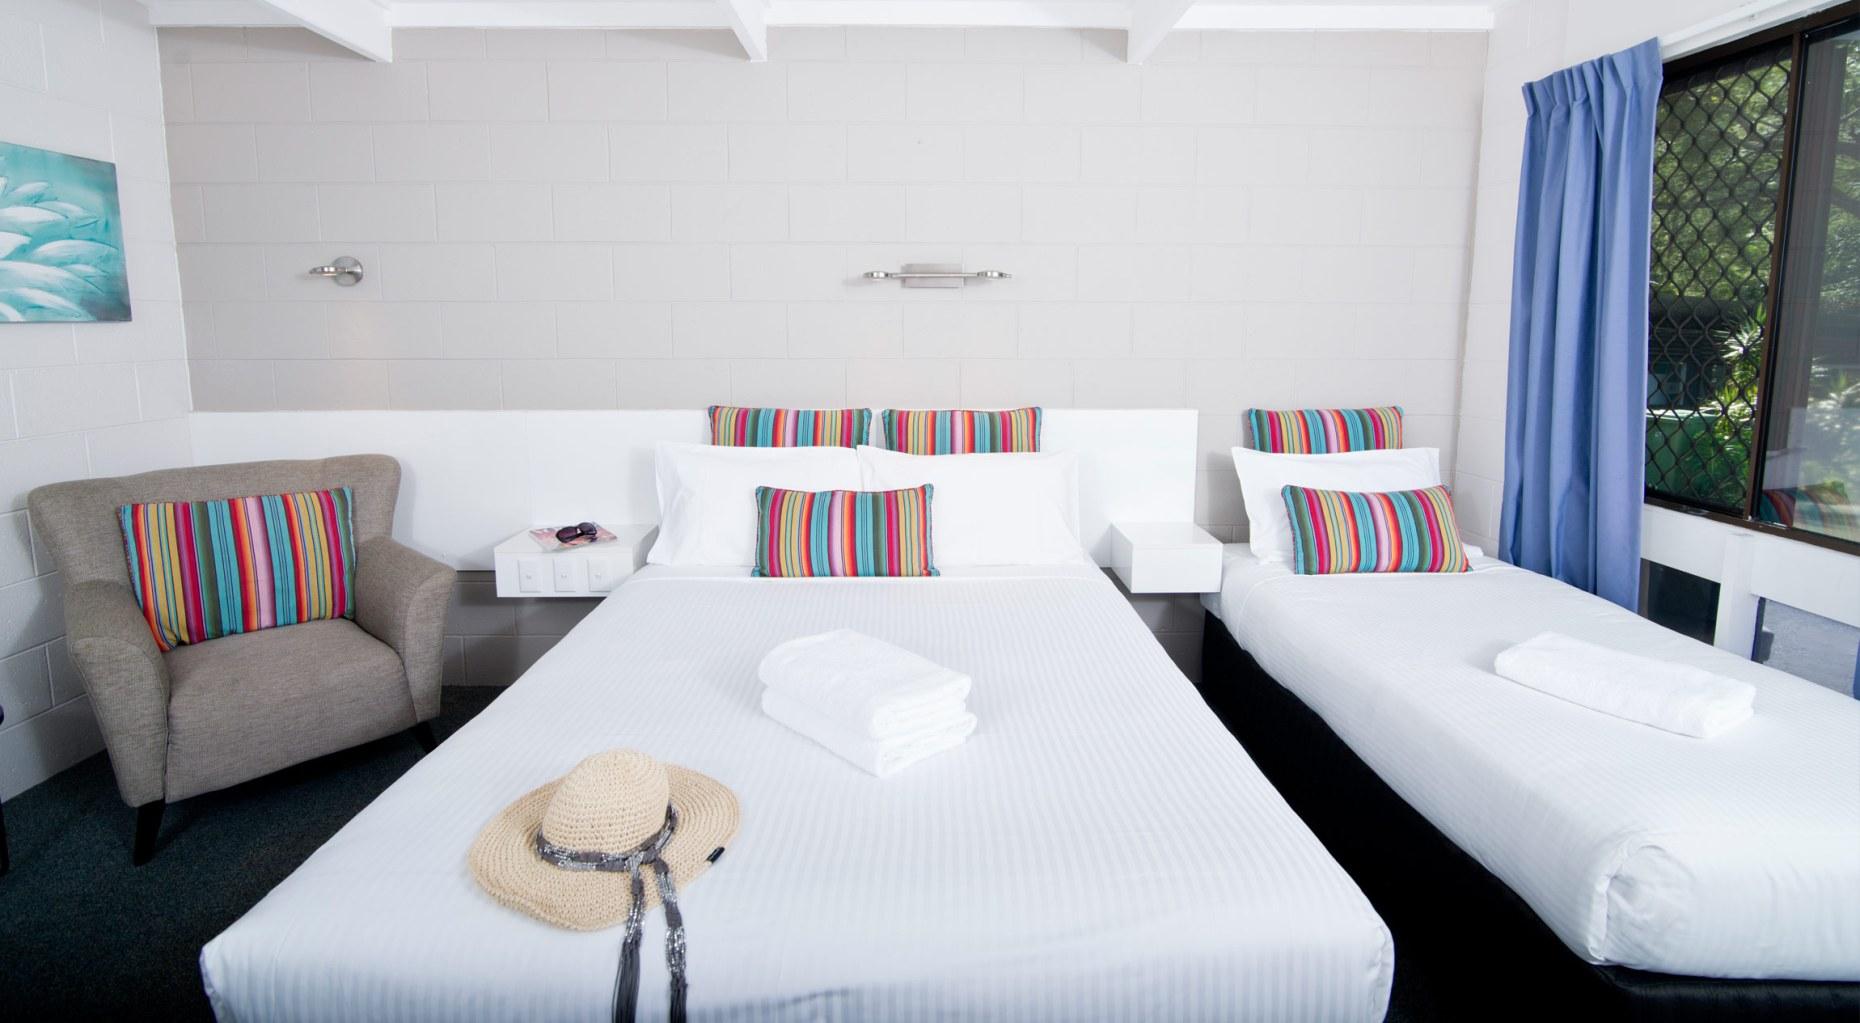 Buderim Fiesta motel treble room